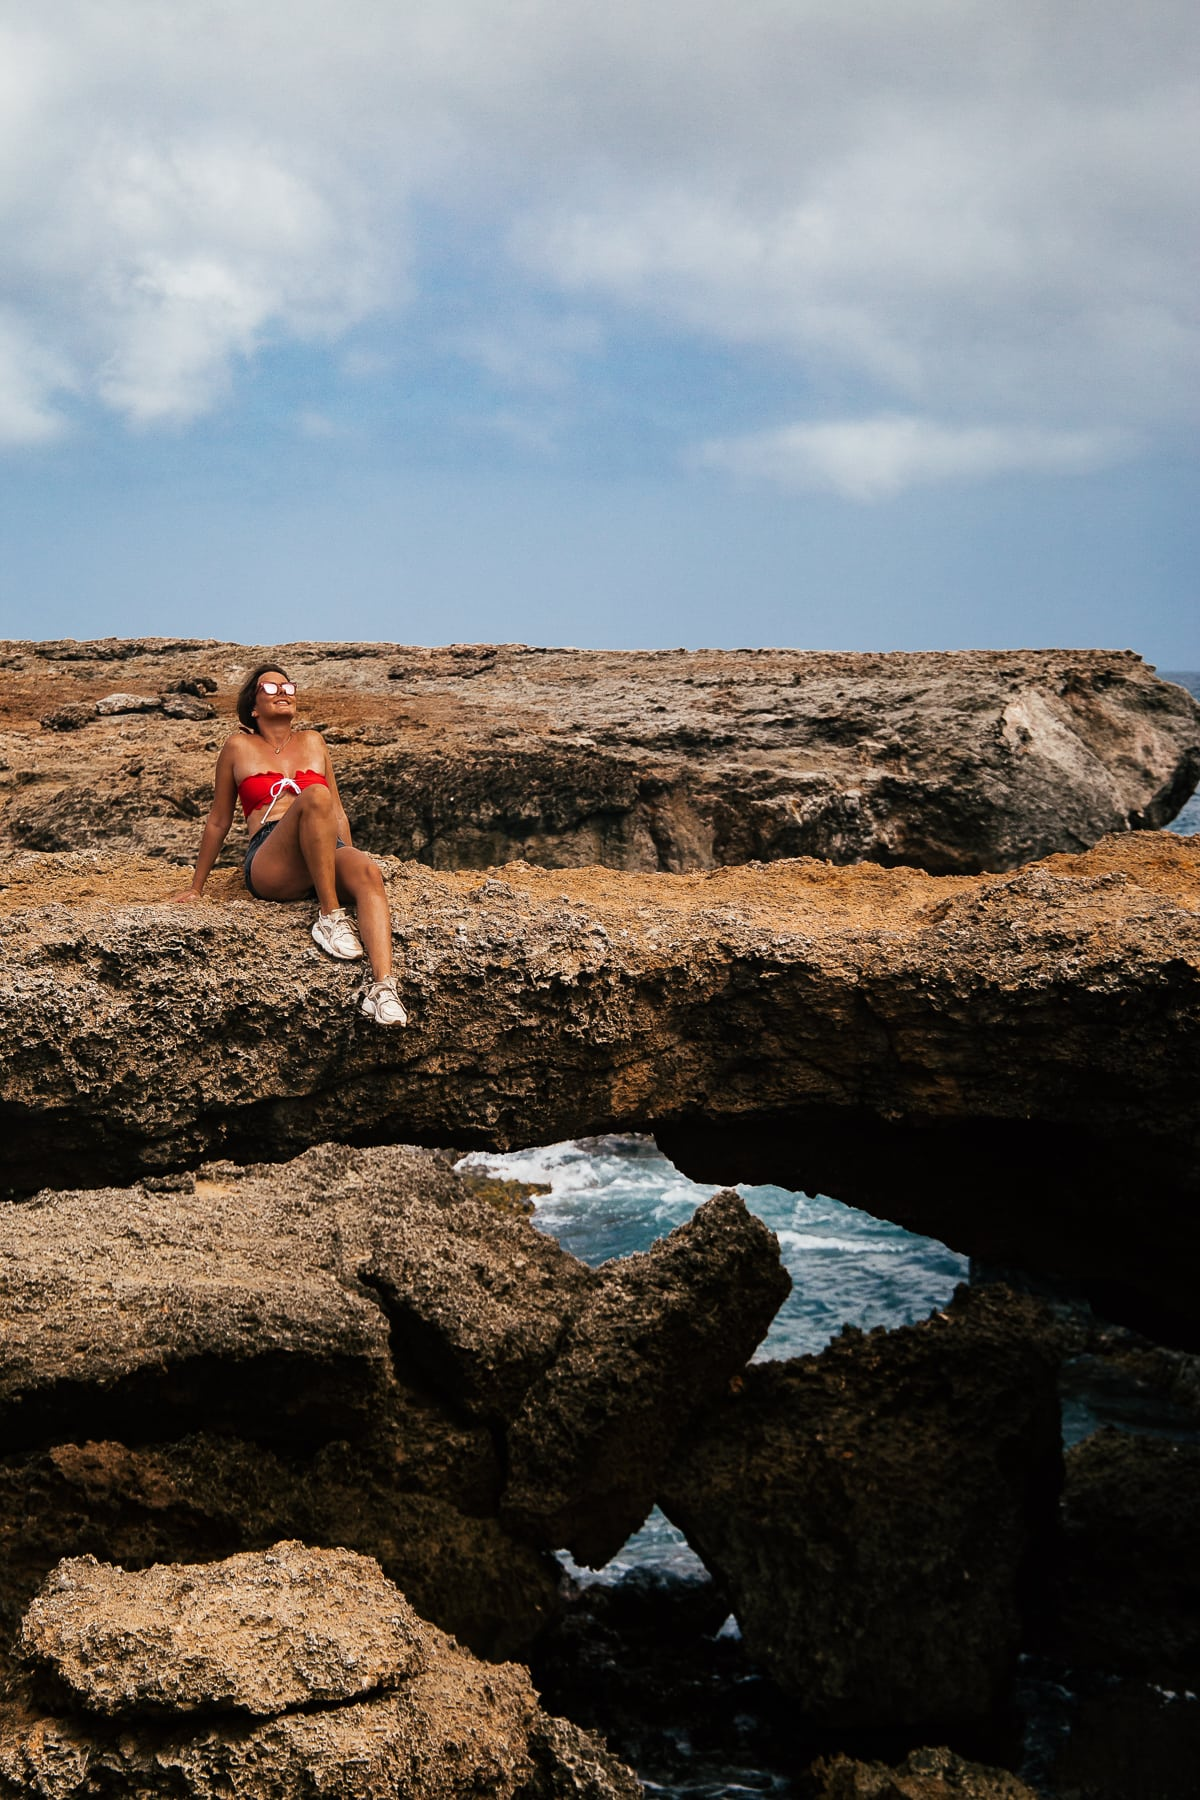 Natural Bridge im Norden von Aruba - Ausflugsziele im Arikok Nationalpark